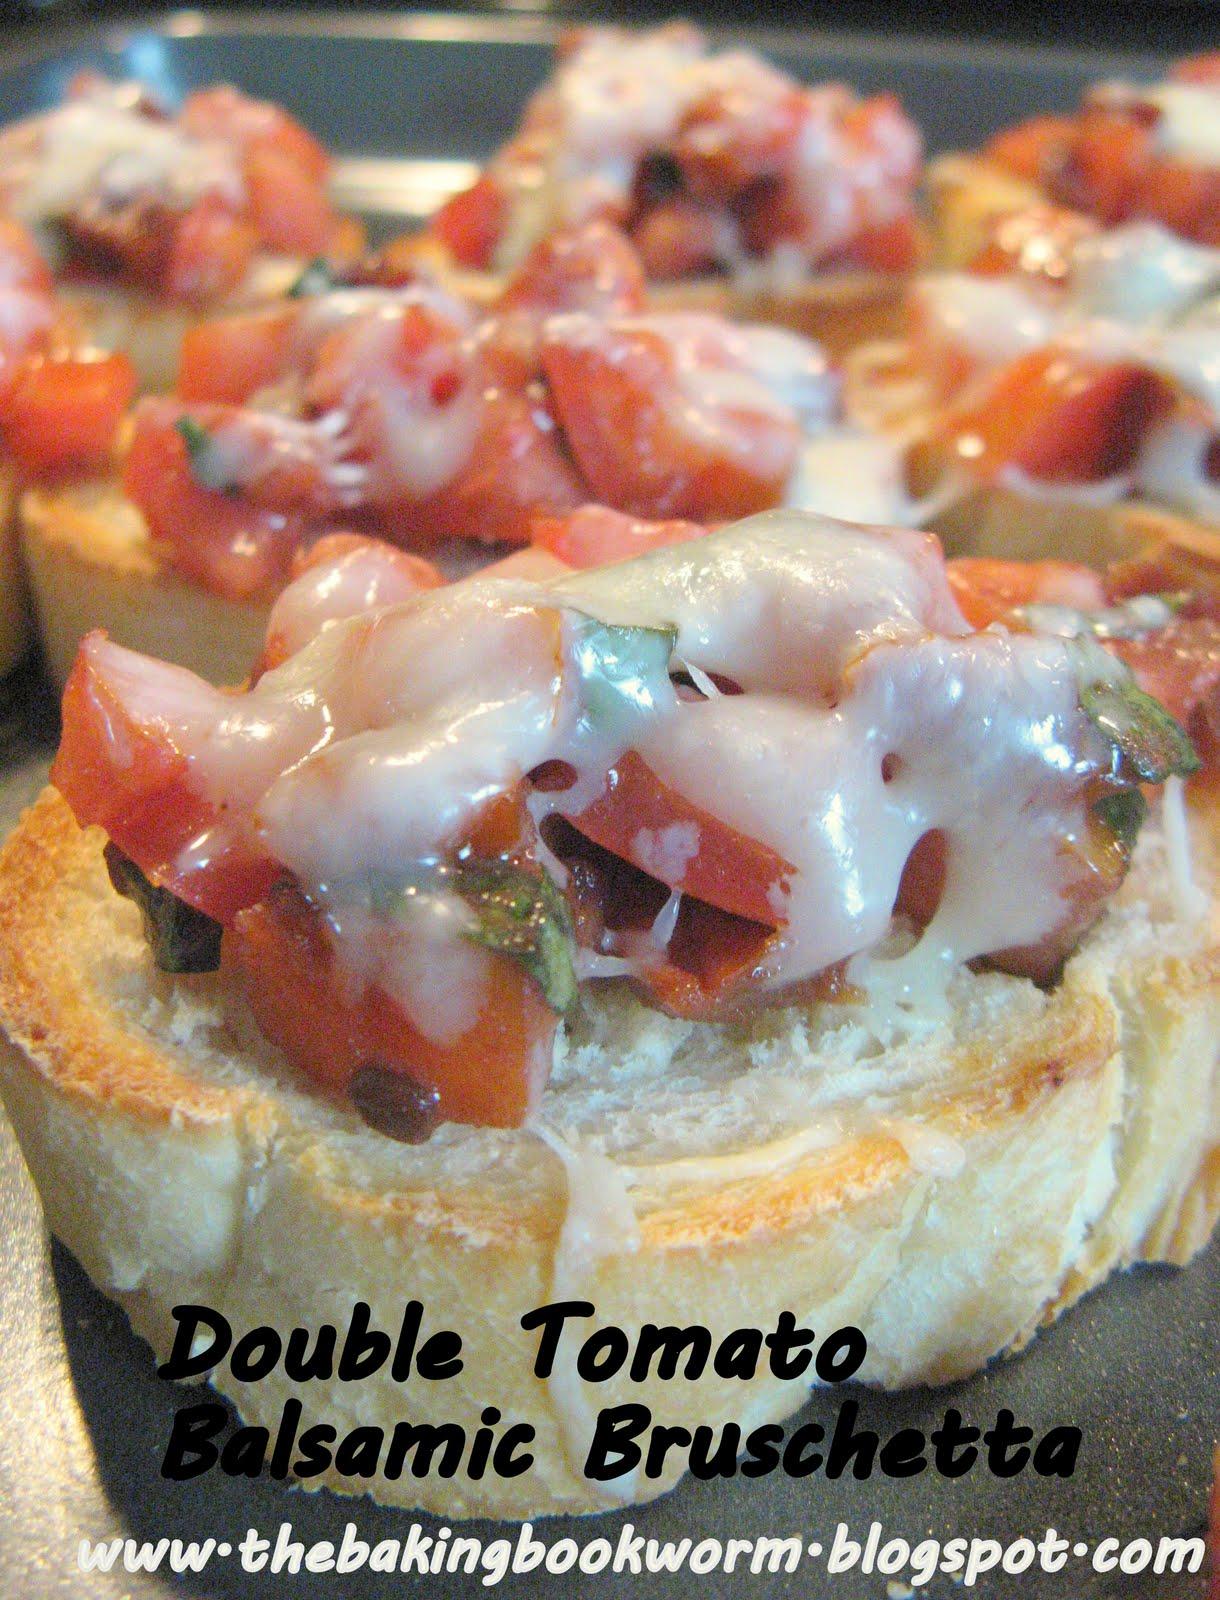 The Baking Bookworm: Double Tomato Balsamic Bruschetta